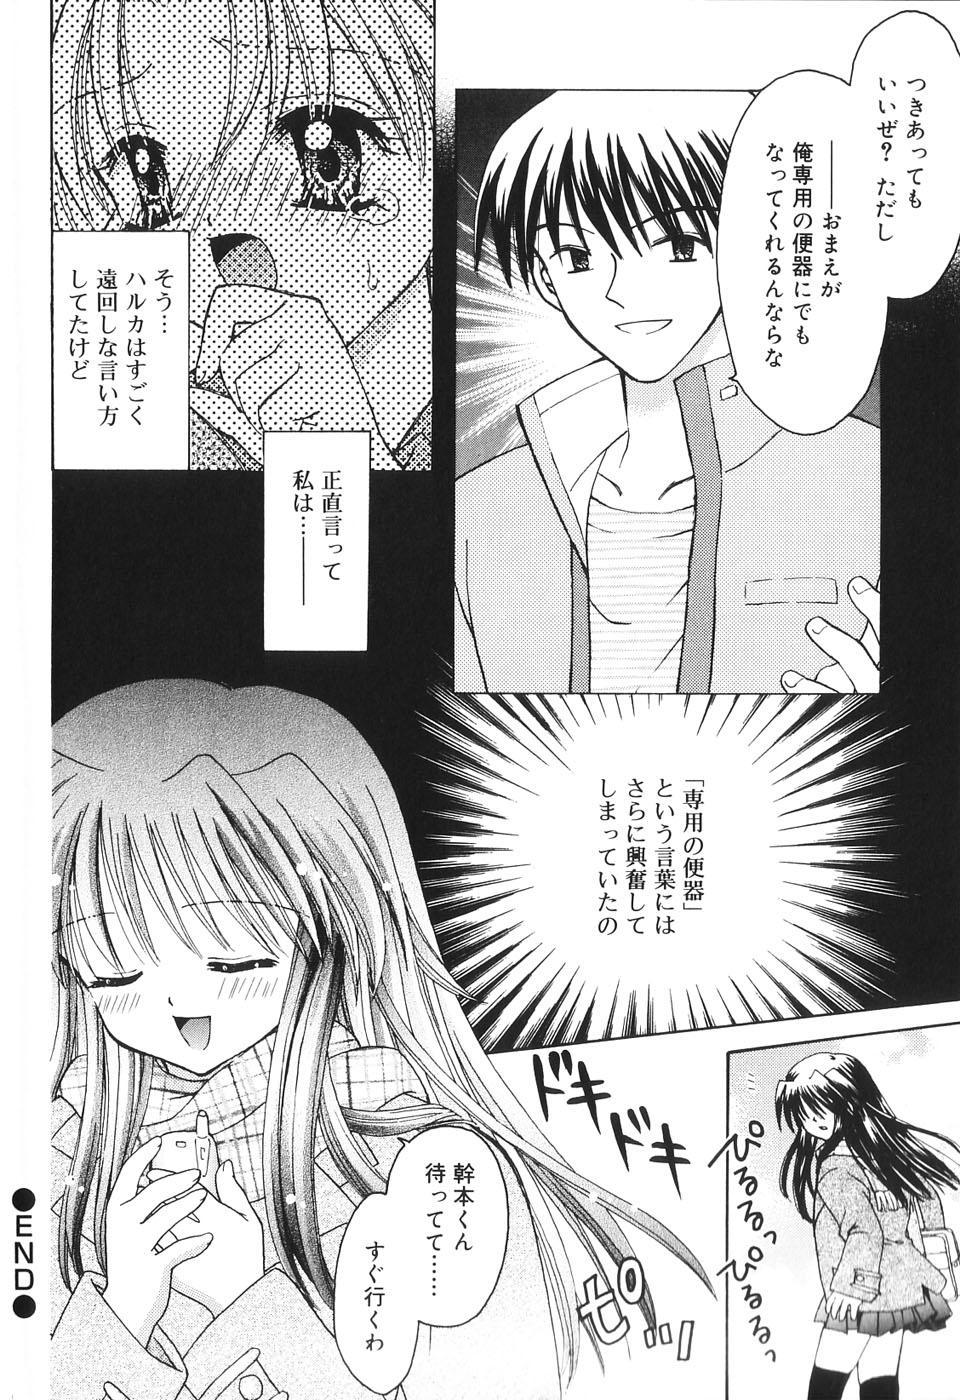 Musoubana 164